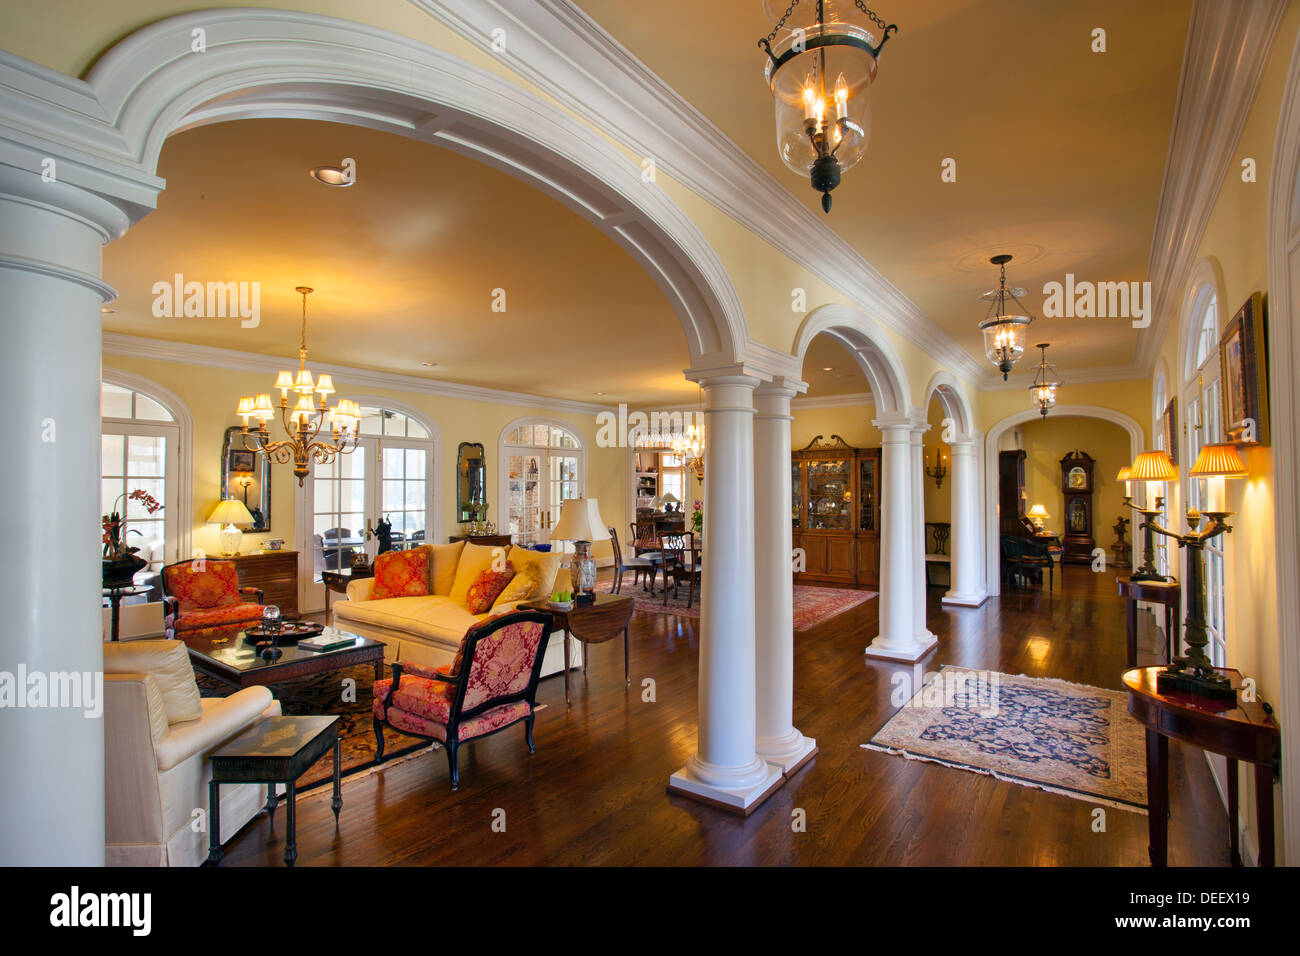 Luxury Home Interior In Nashville Tennessee, USA